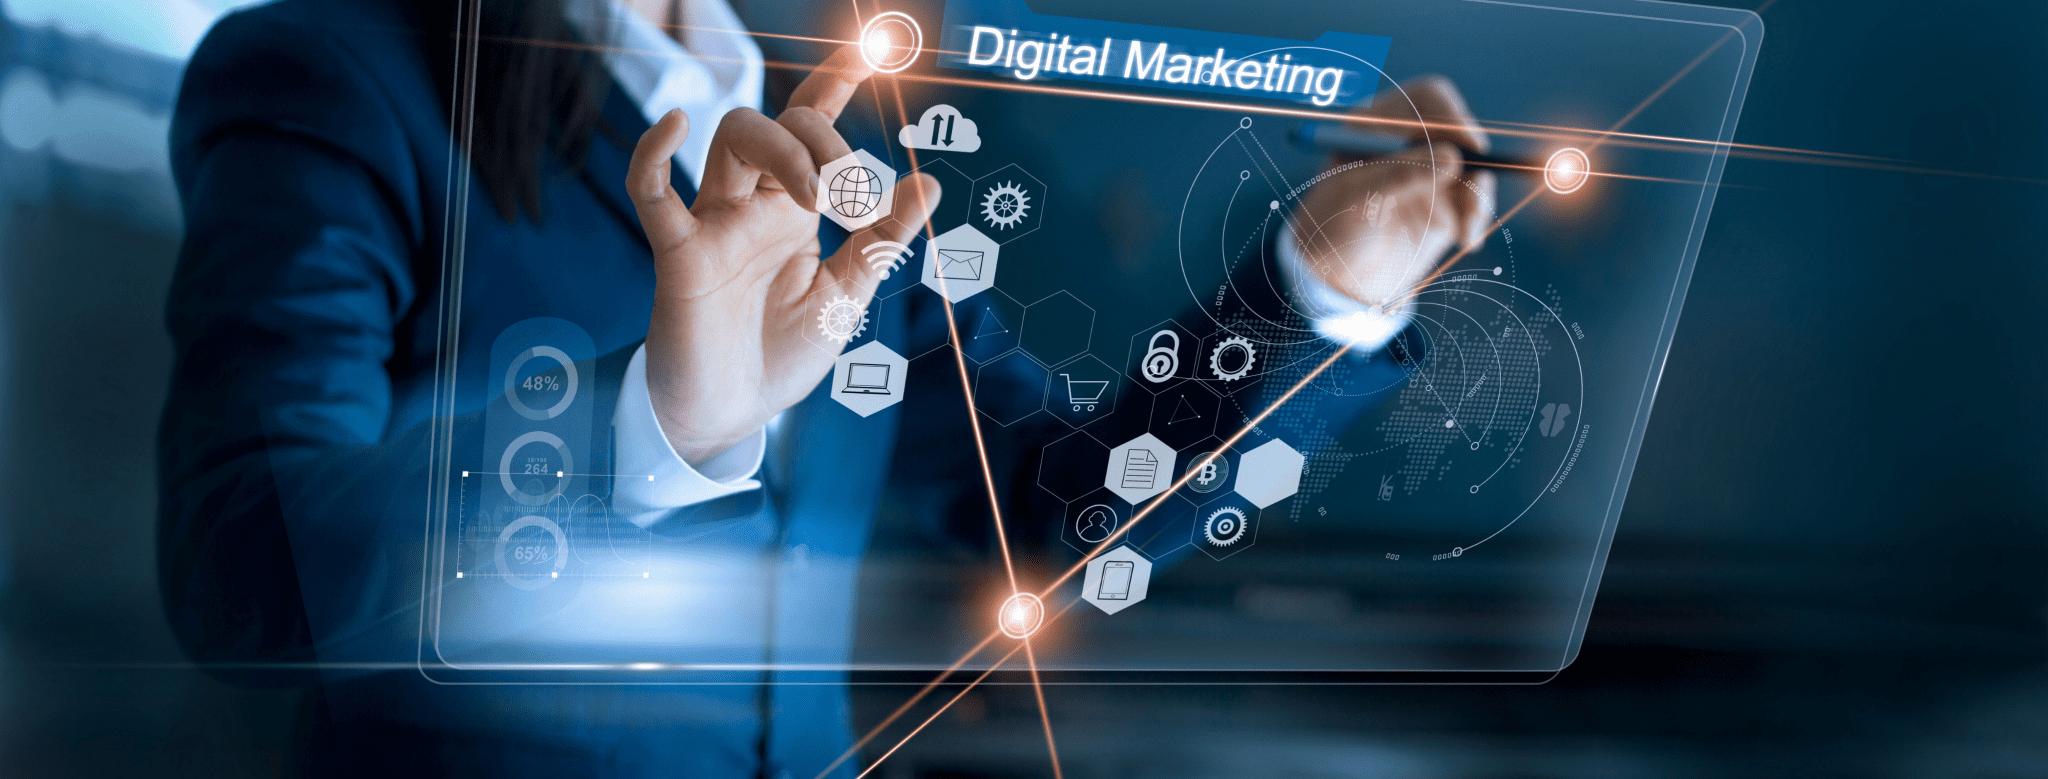 digital marketing professional